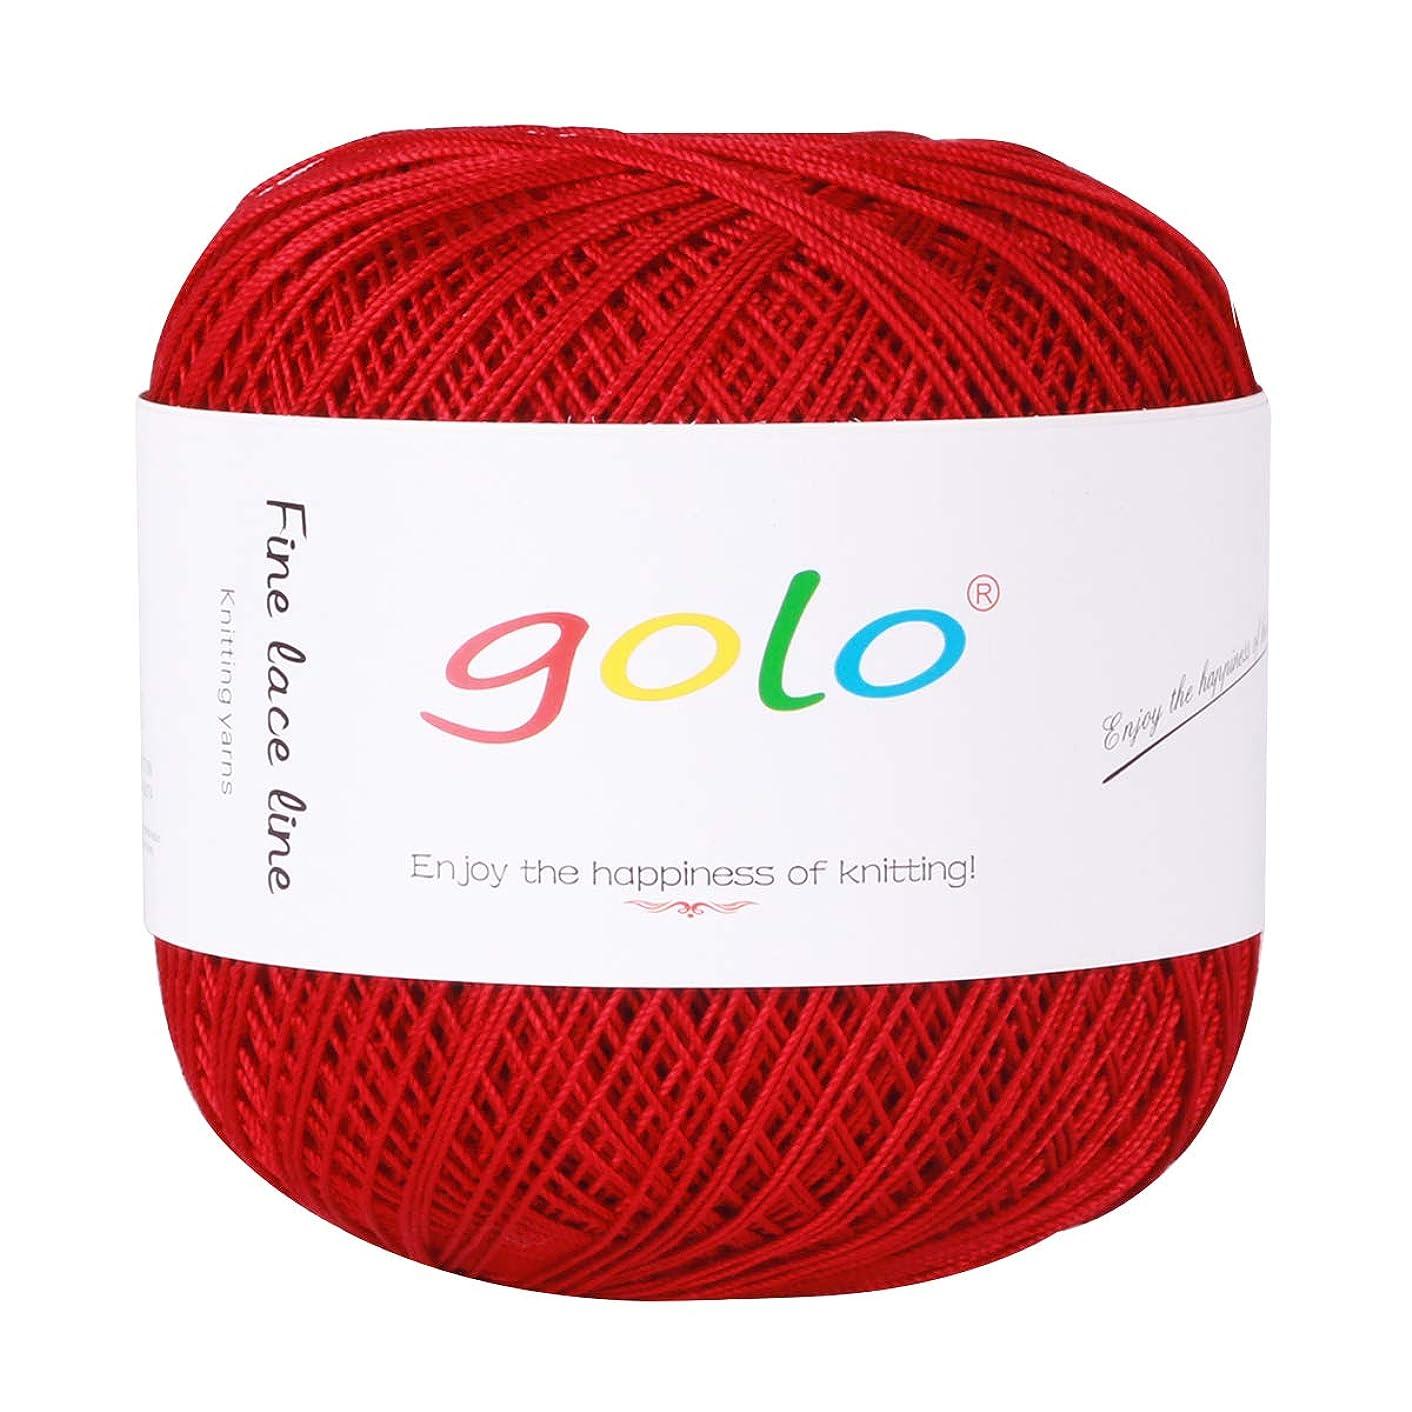 Crochet Thread Yarns for Begingers Size6-100% Contton Yarn for Knitting Crochet DIY Hardanger Cross Sitch Crochet Thread Balls Rainbow Turquoise 39 Colors Avilable (Wine red)